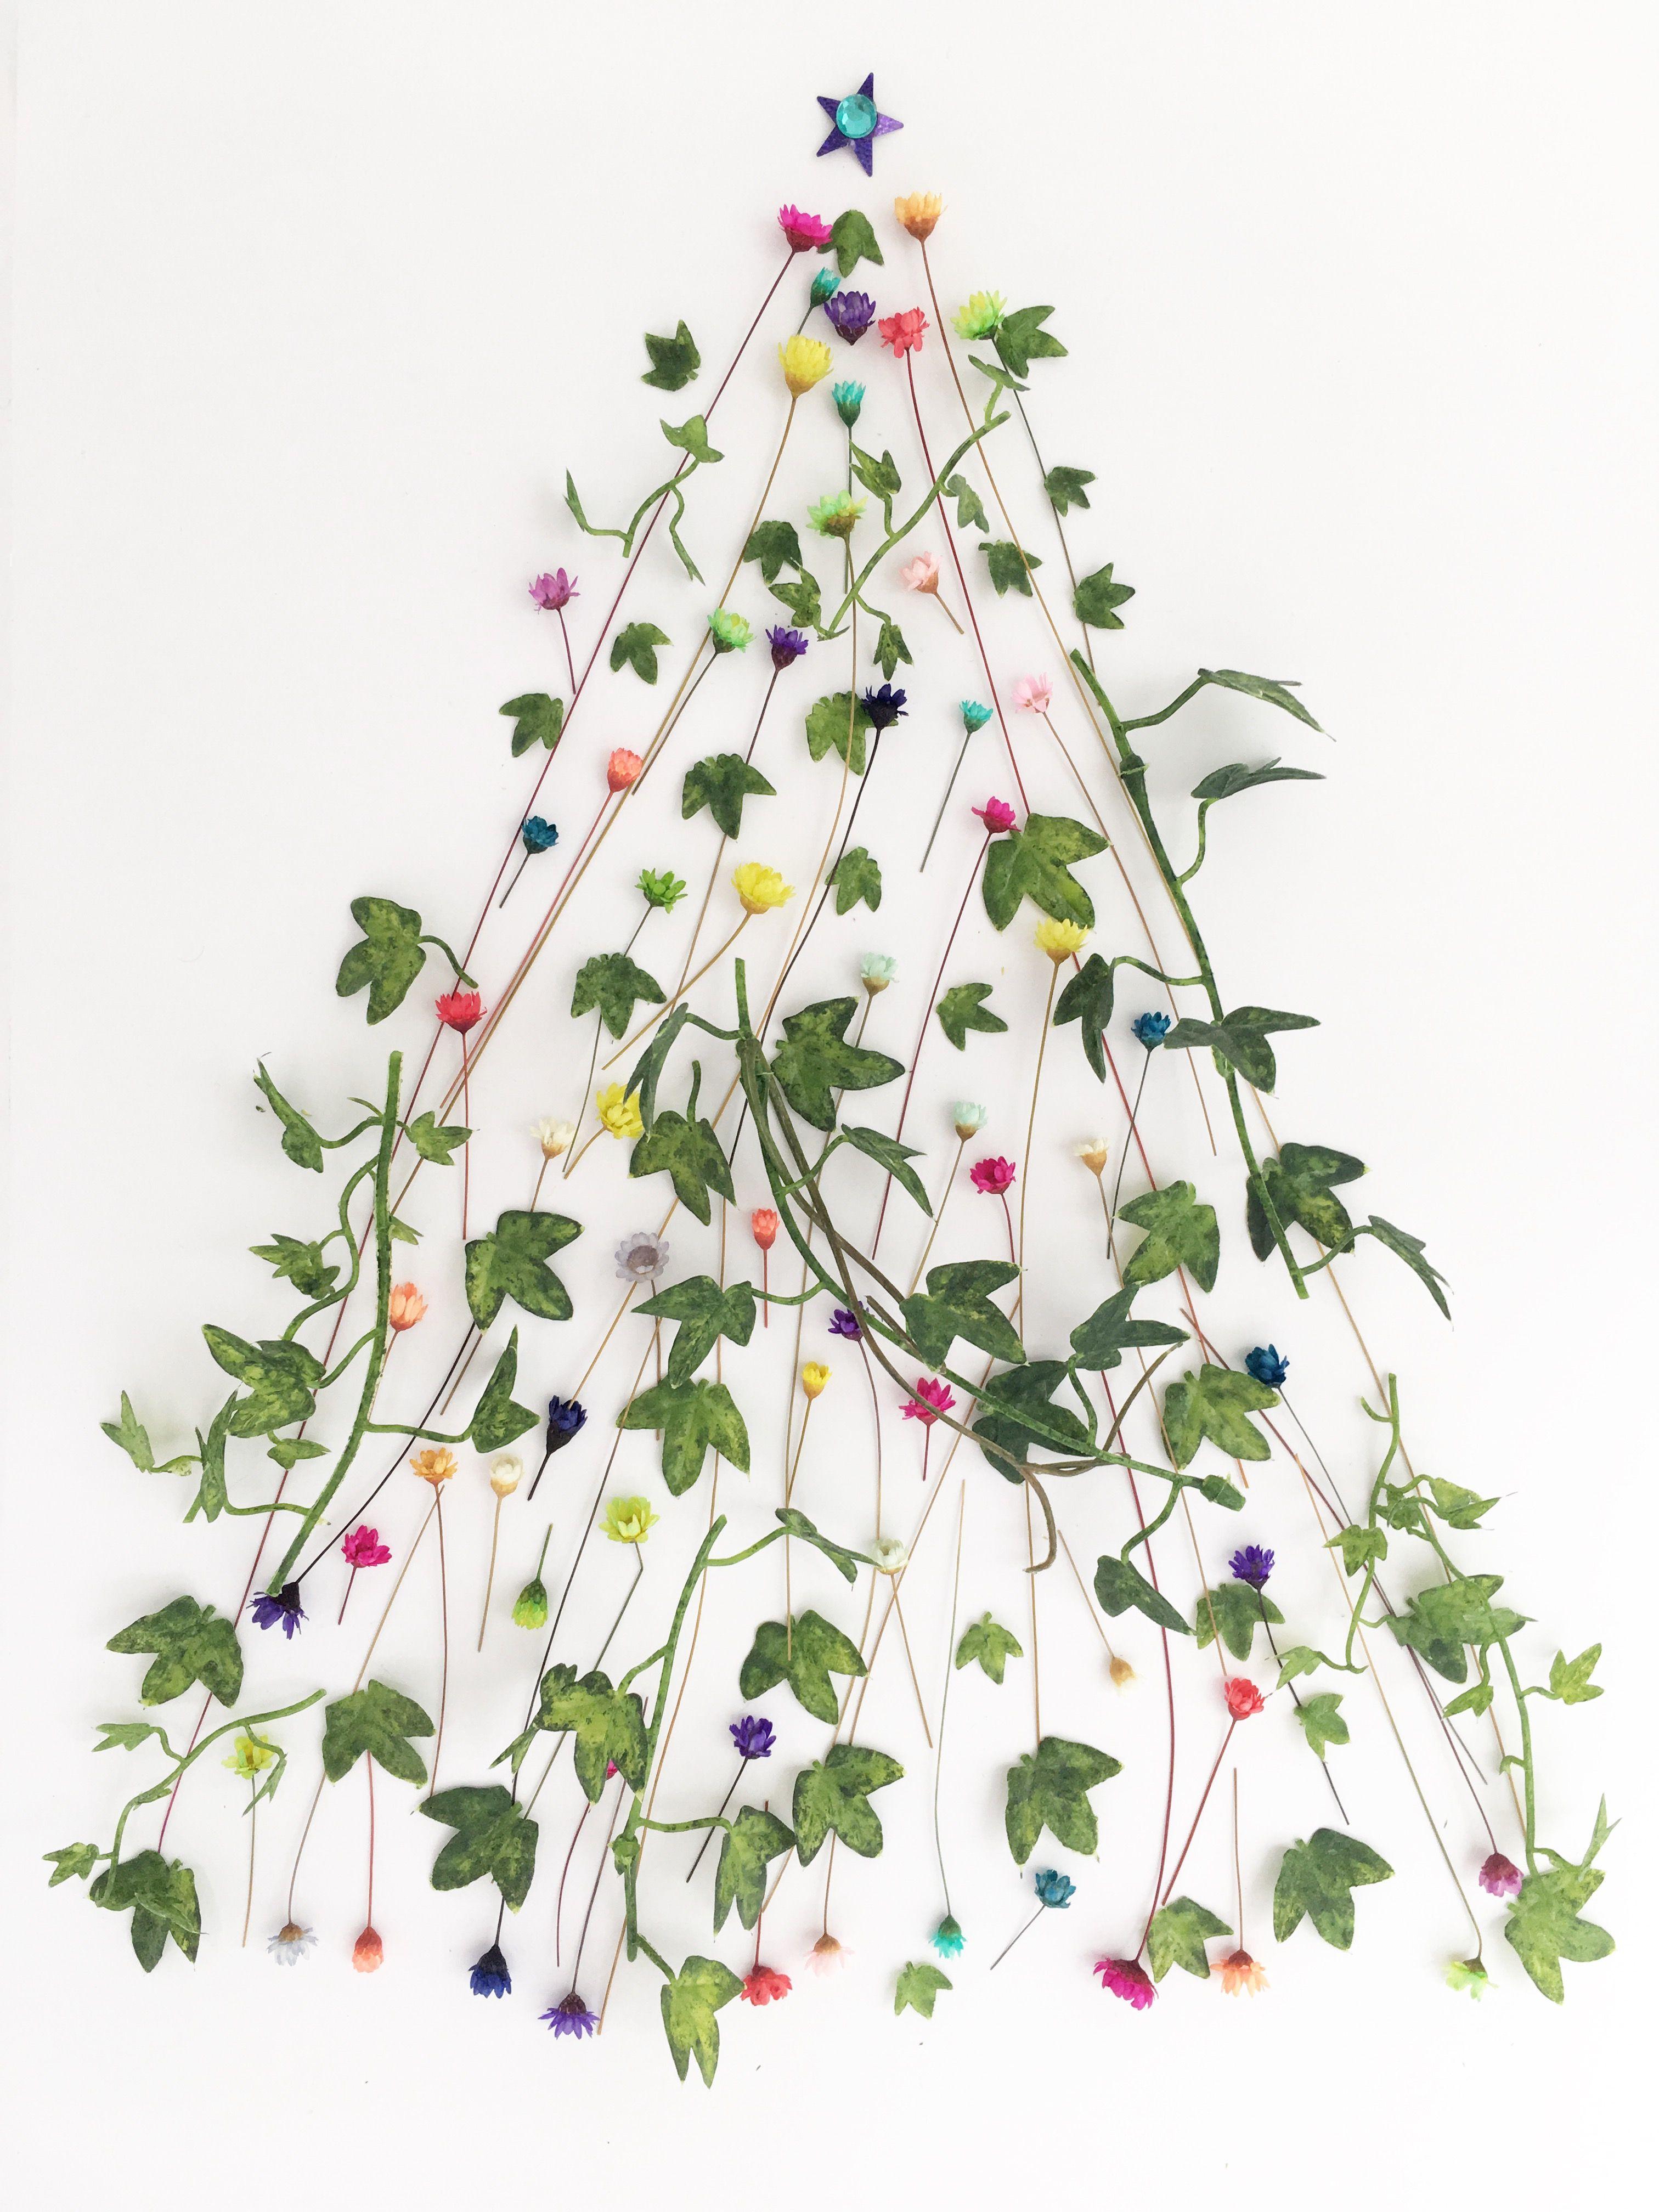 Merry Christmas Everlasting Flowers Chrysanthemum Flower Bloom